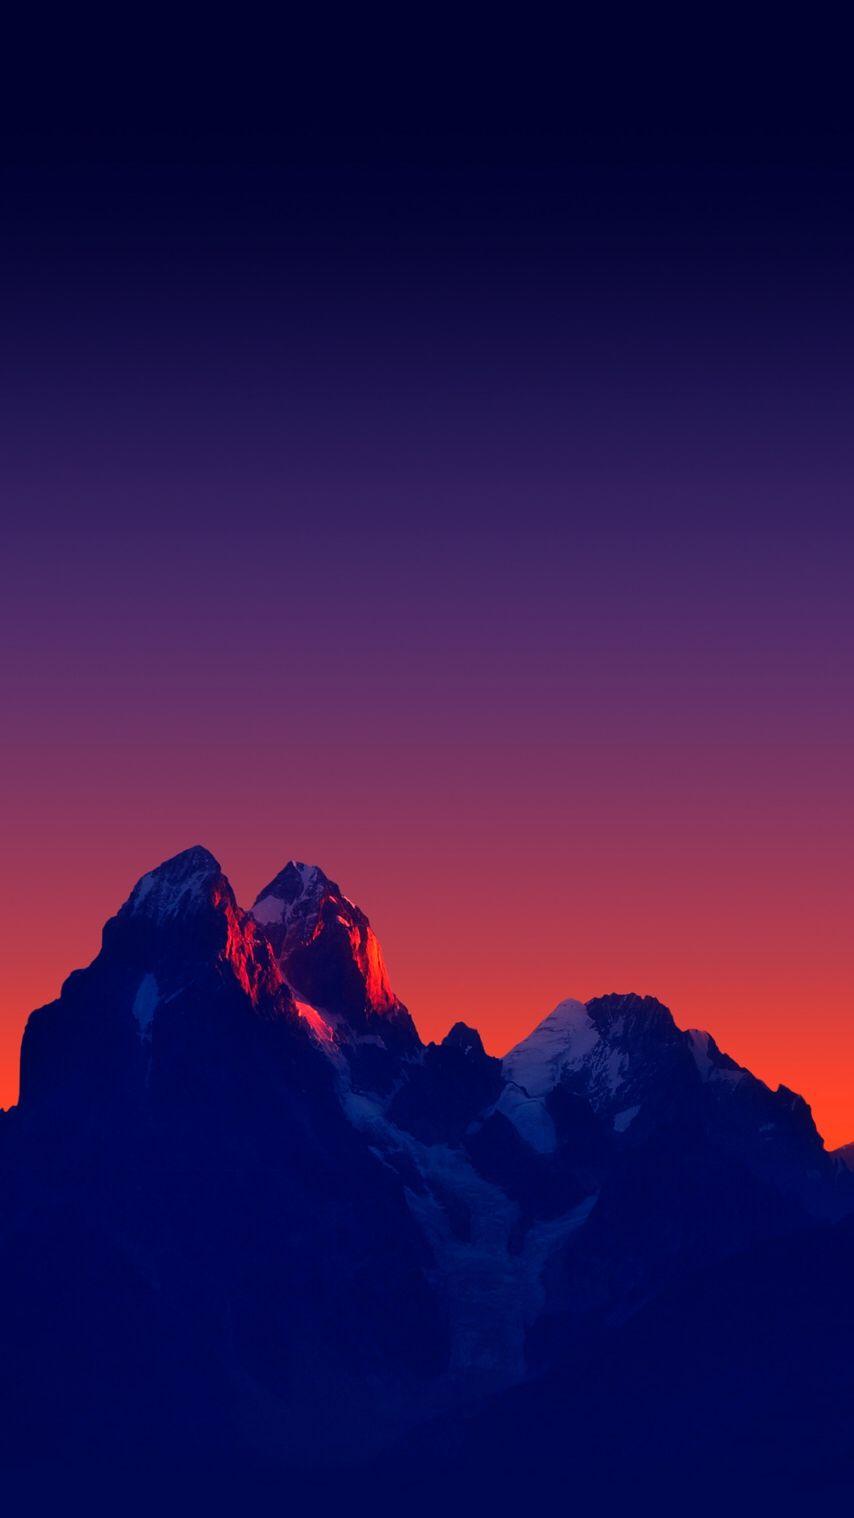 Mountains Minimal Sunset IPhone Wallpaper - IPhone Wallpapers